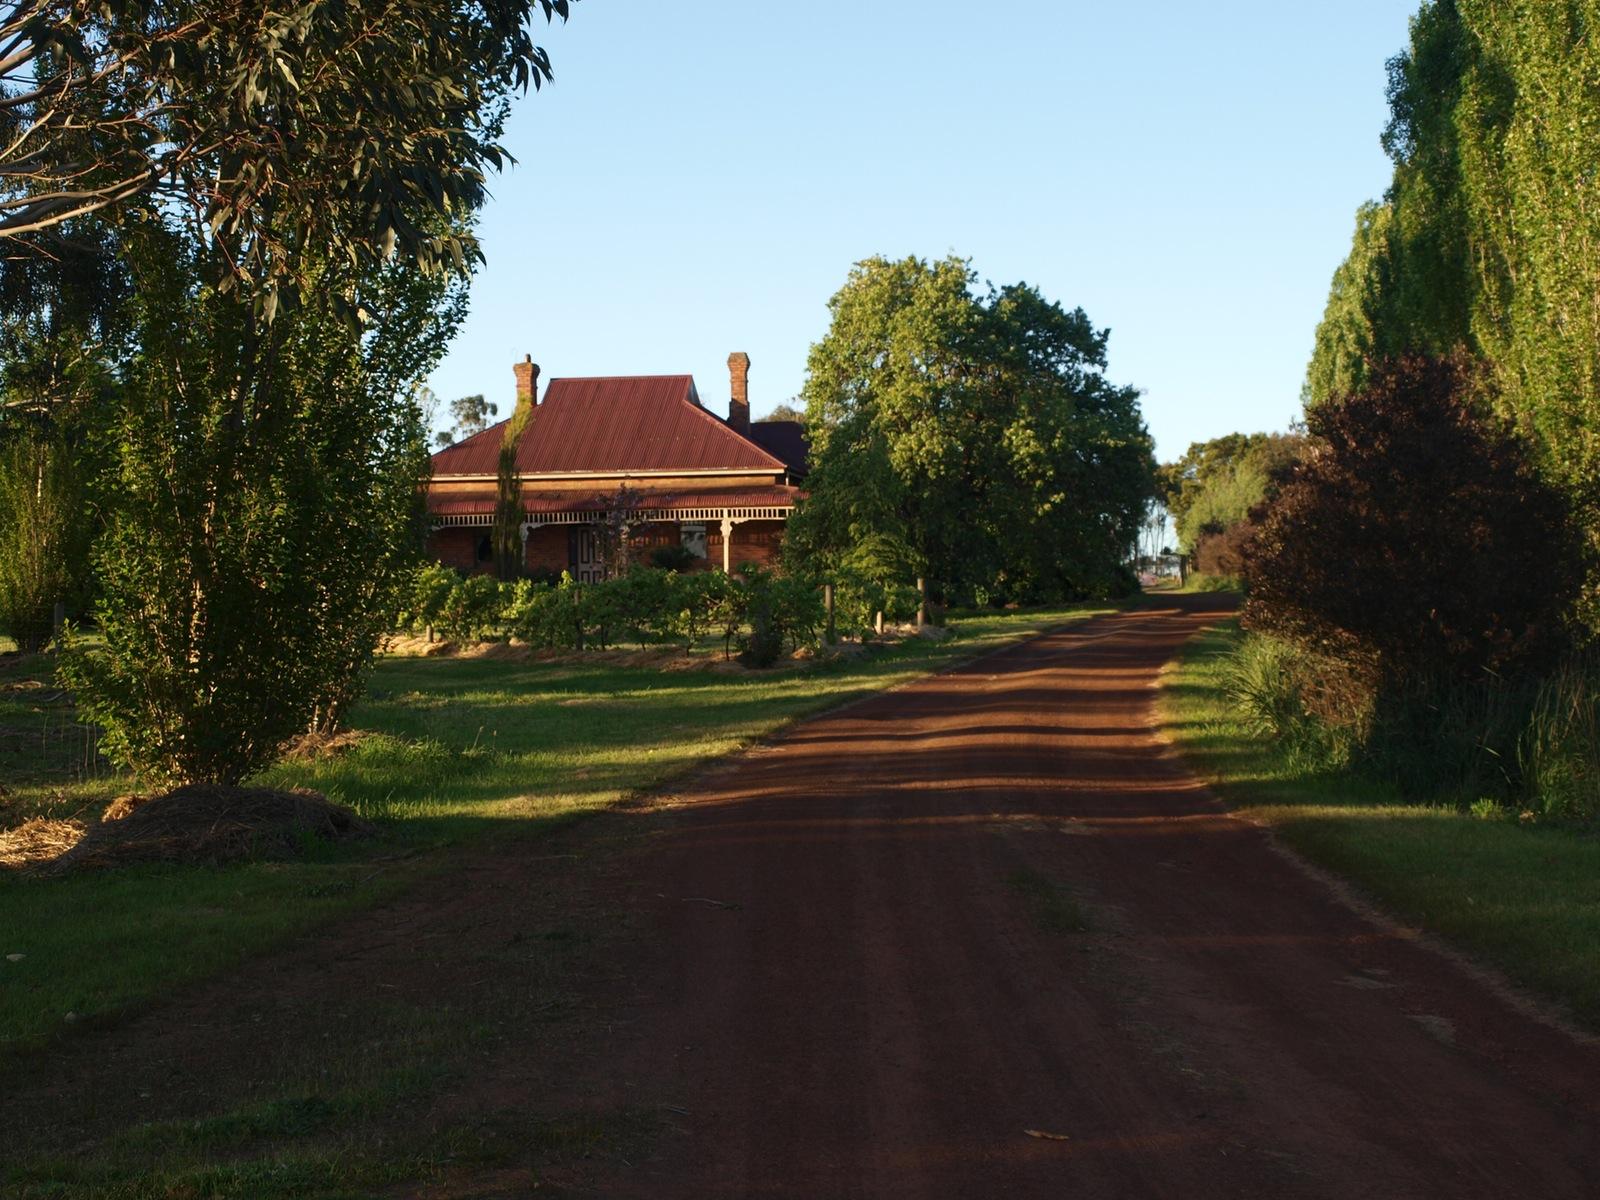 Pierrepoint entrance